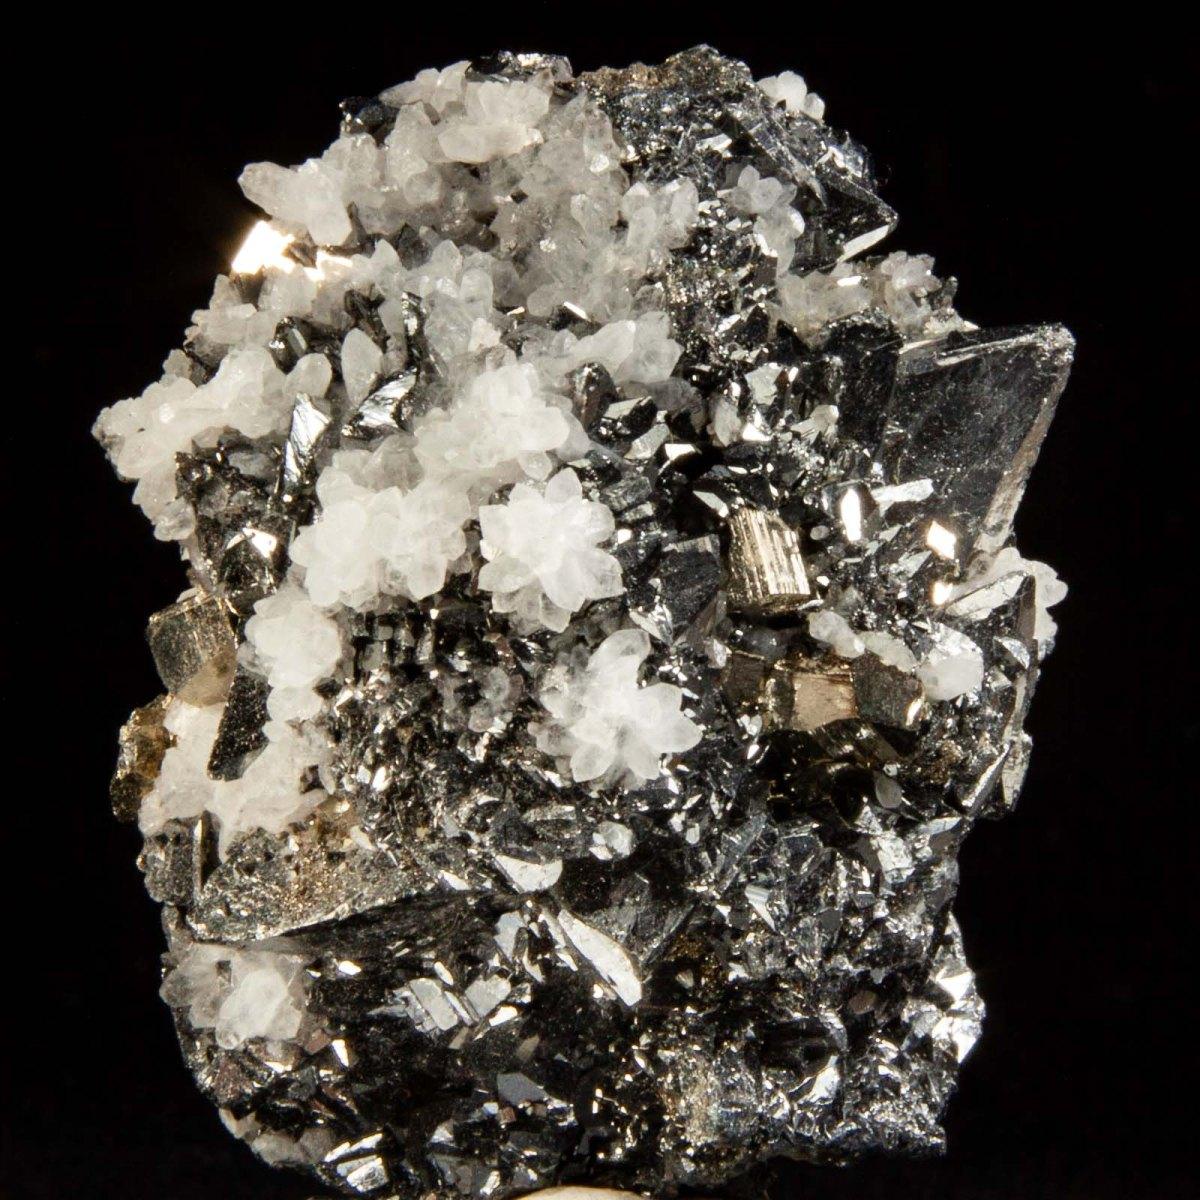 Tetrahedrite with Pyrite and Quartz